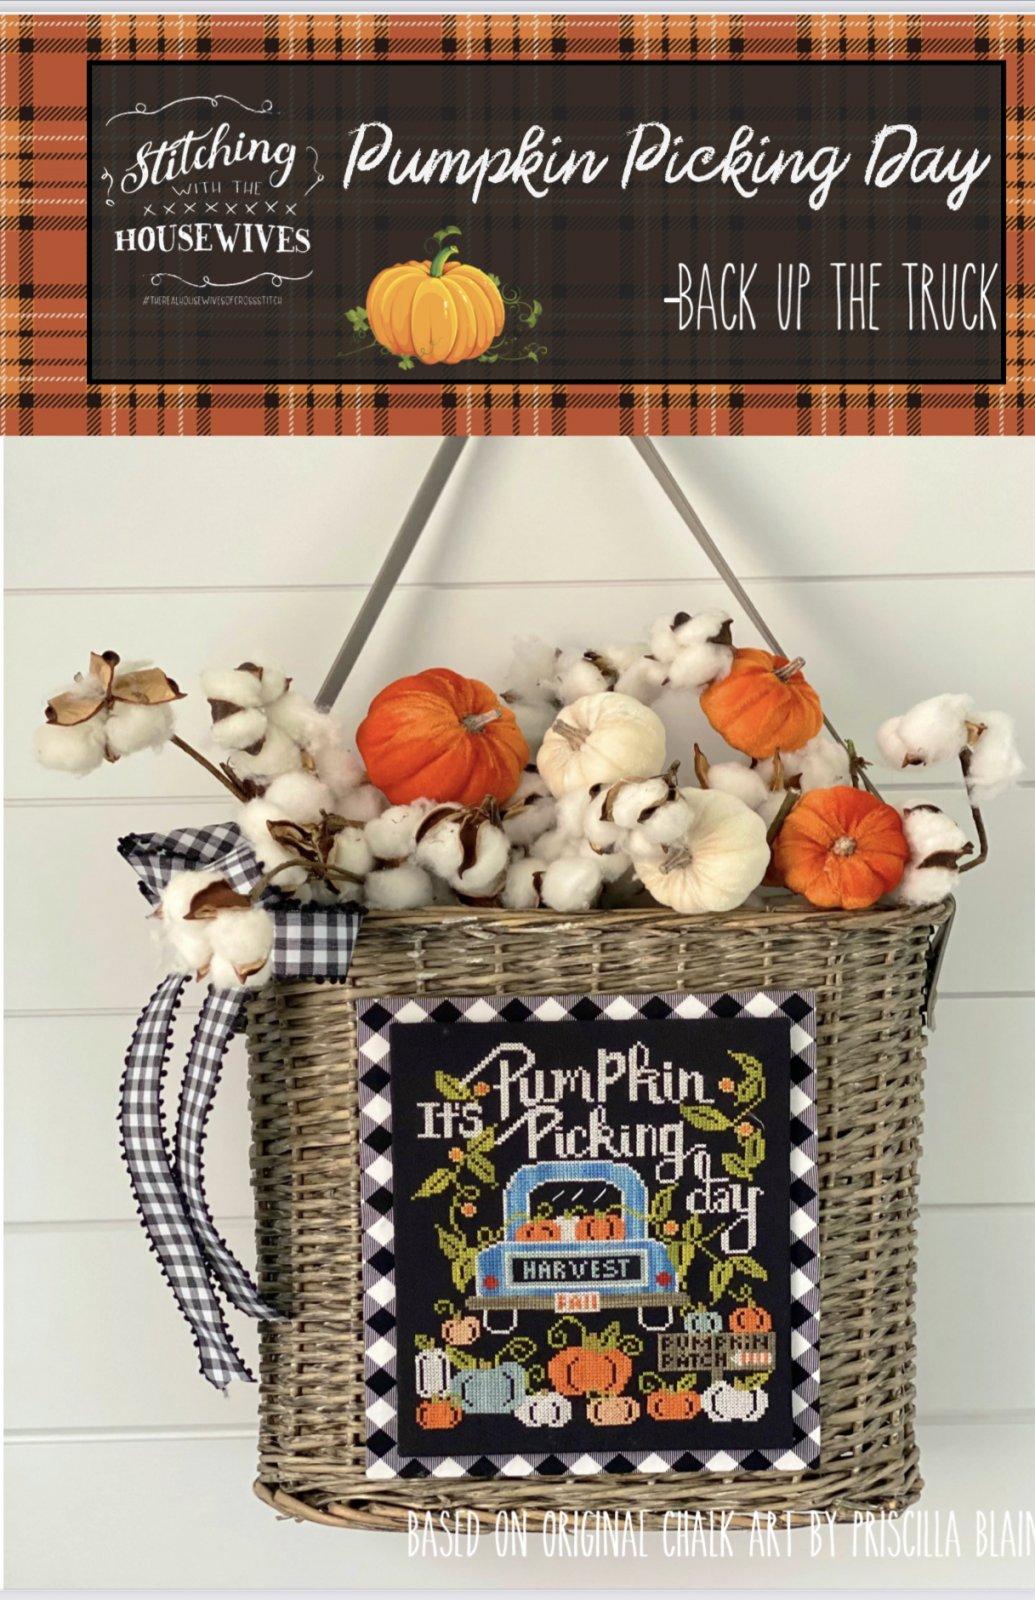 Pumpkin Picking Day